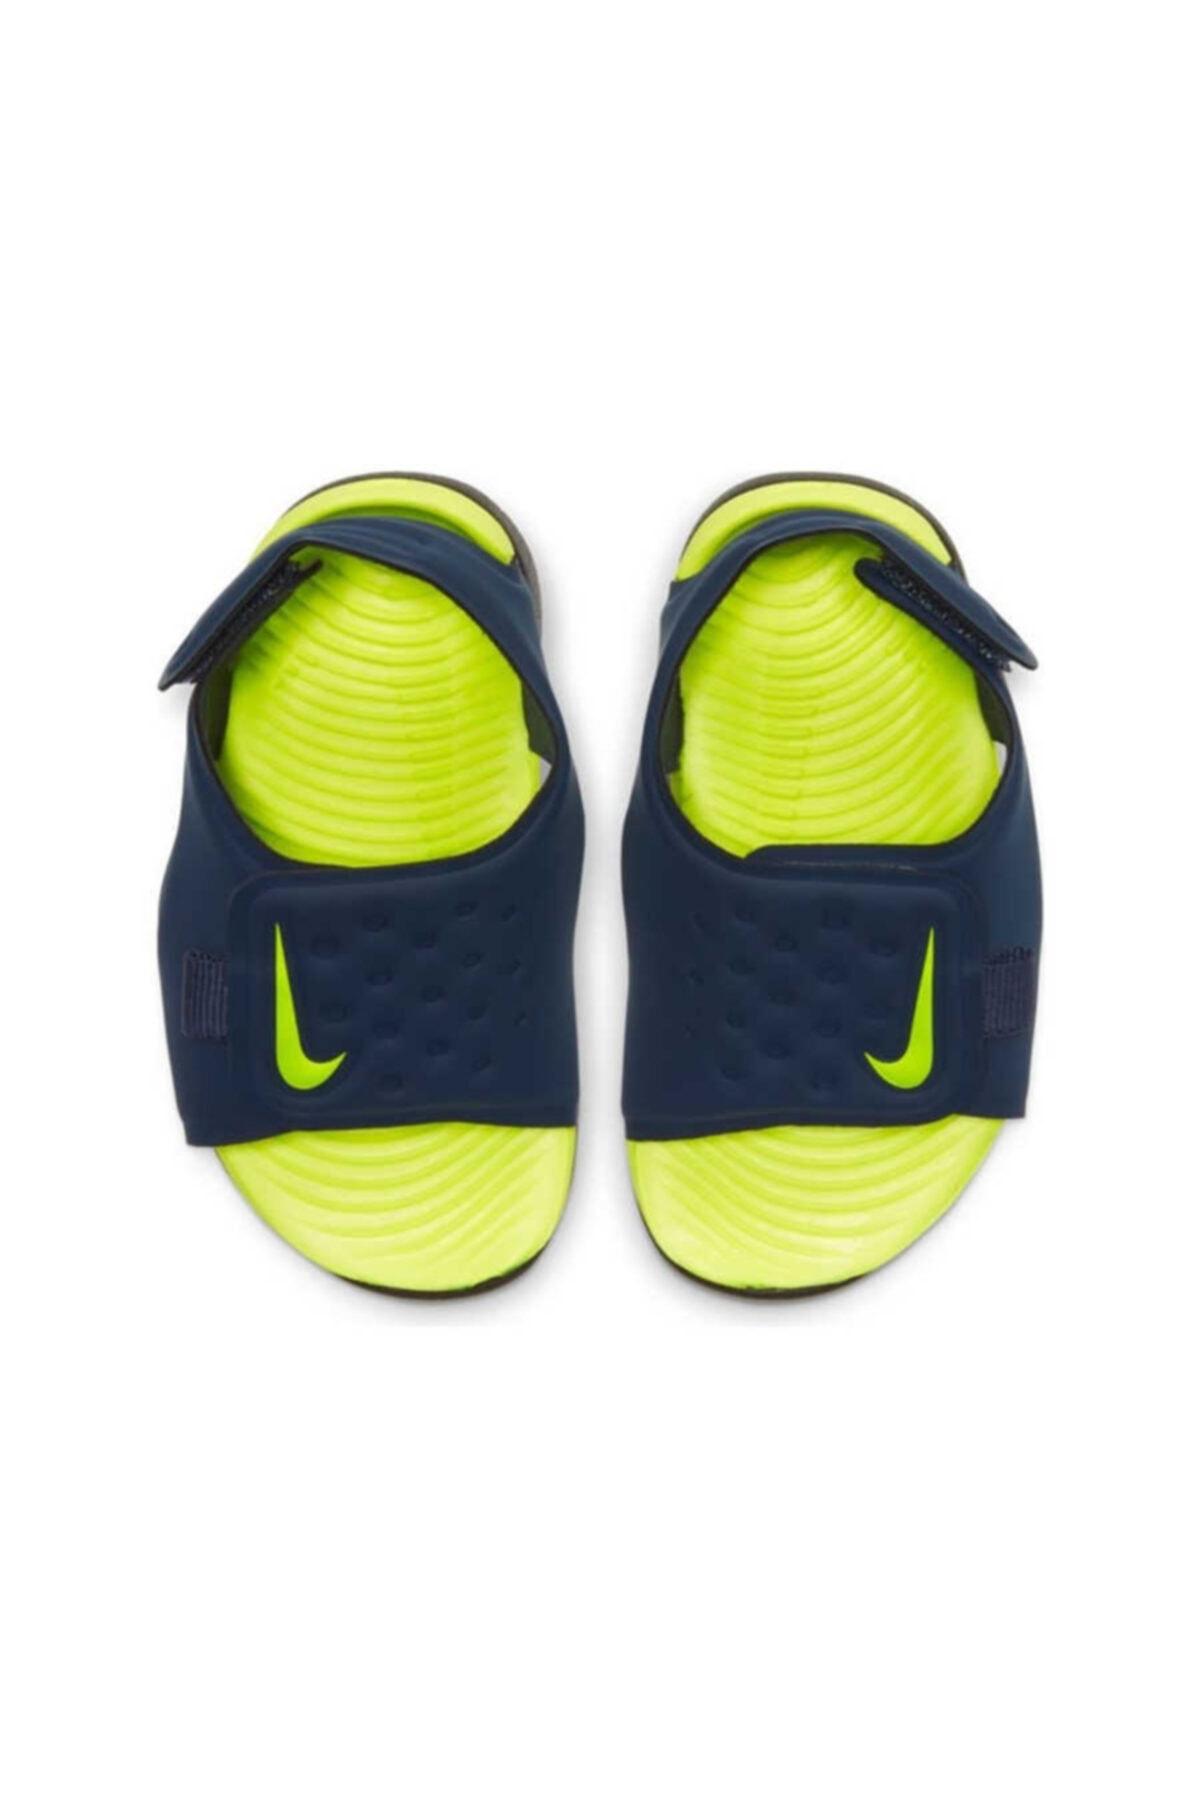 Nike Lacivert Aj9077-401 Sunray Adjust 5 Çocuk Sandalet Aj9077-401 2